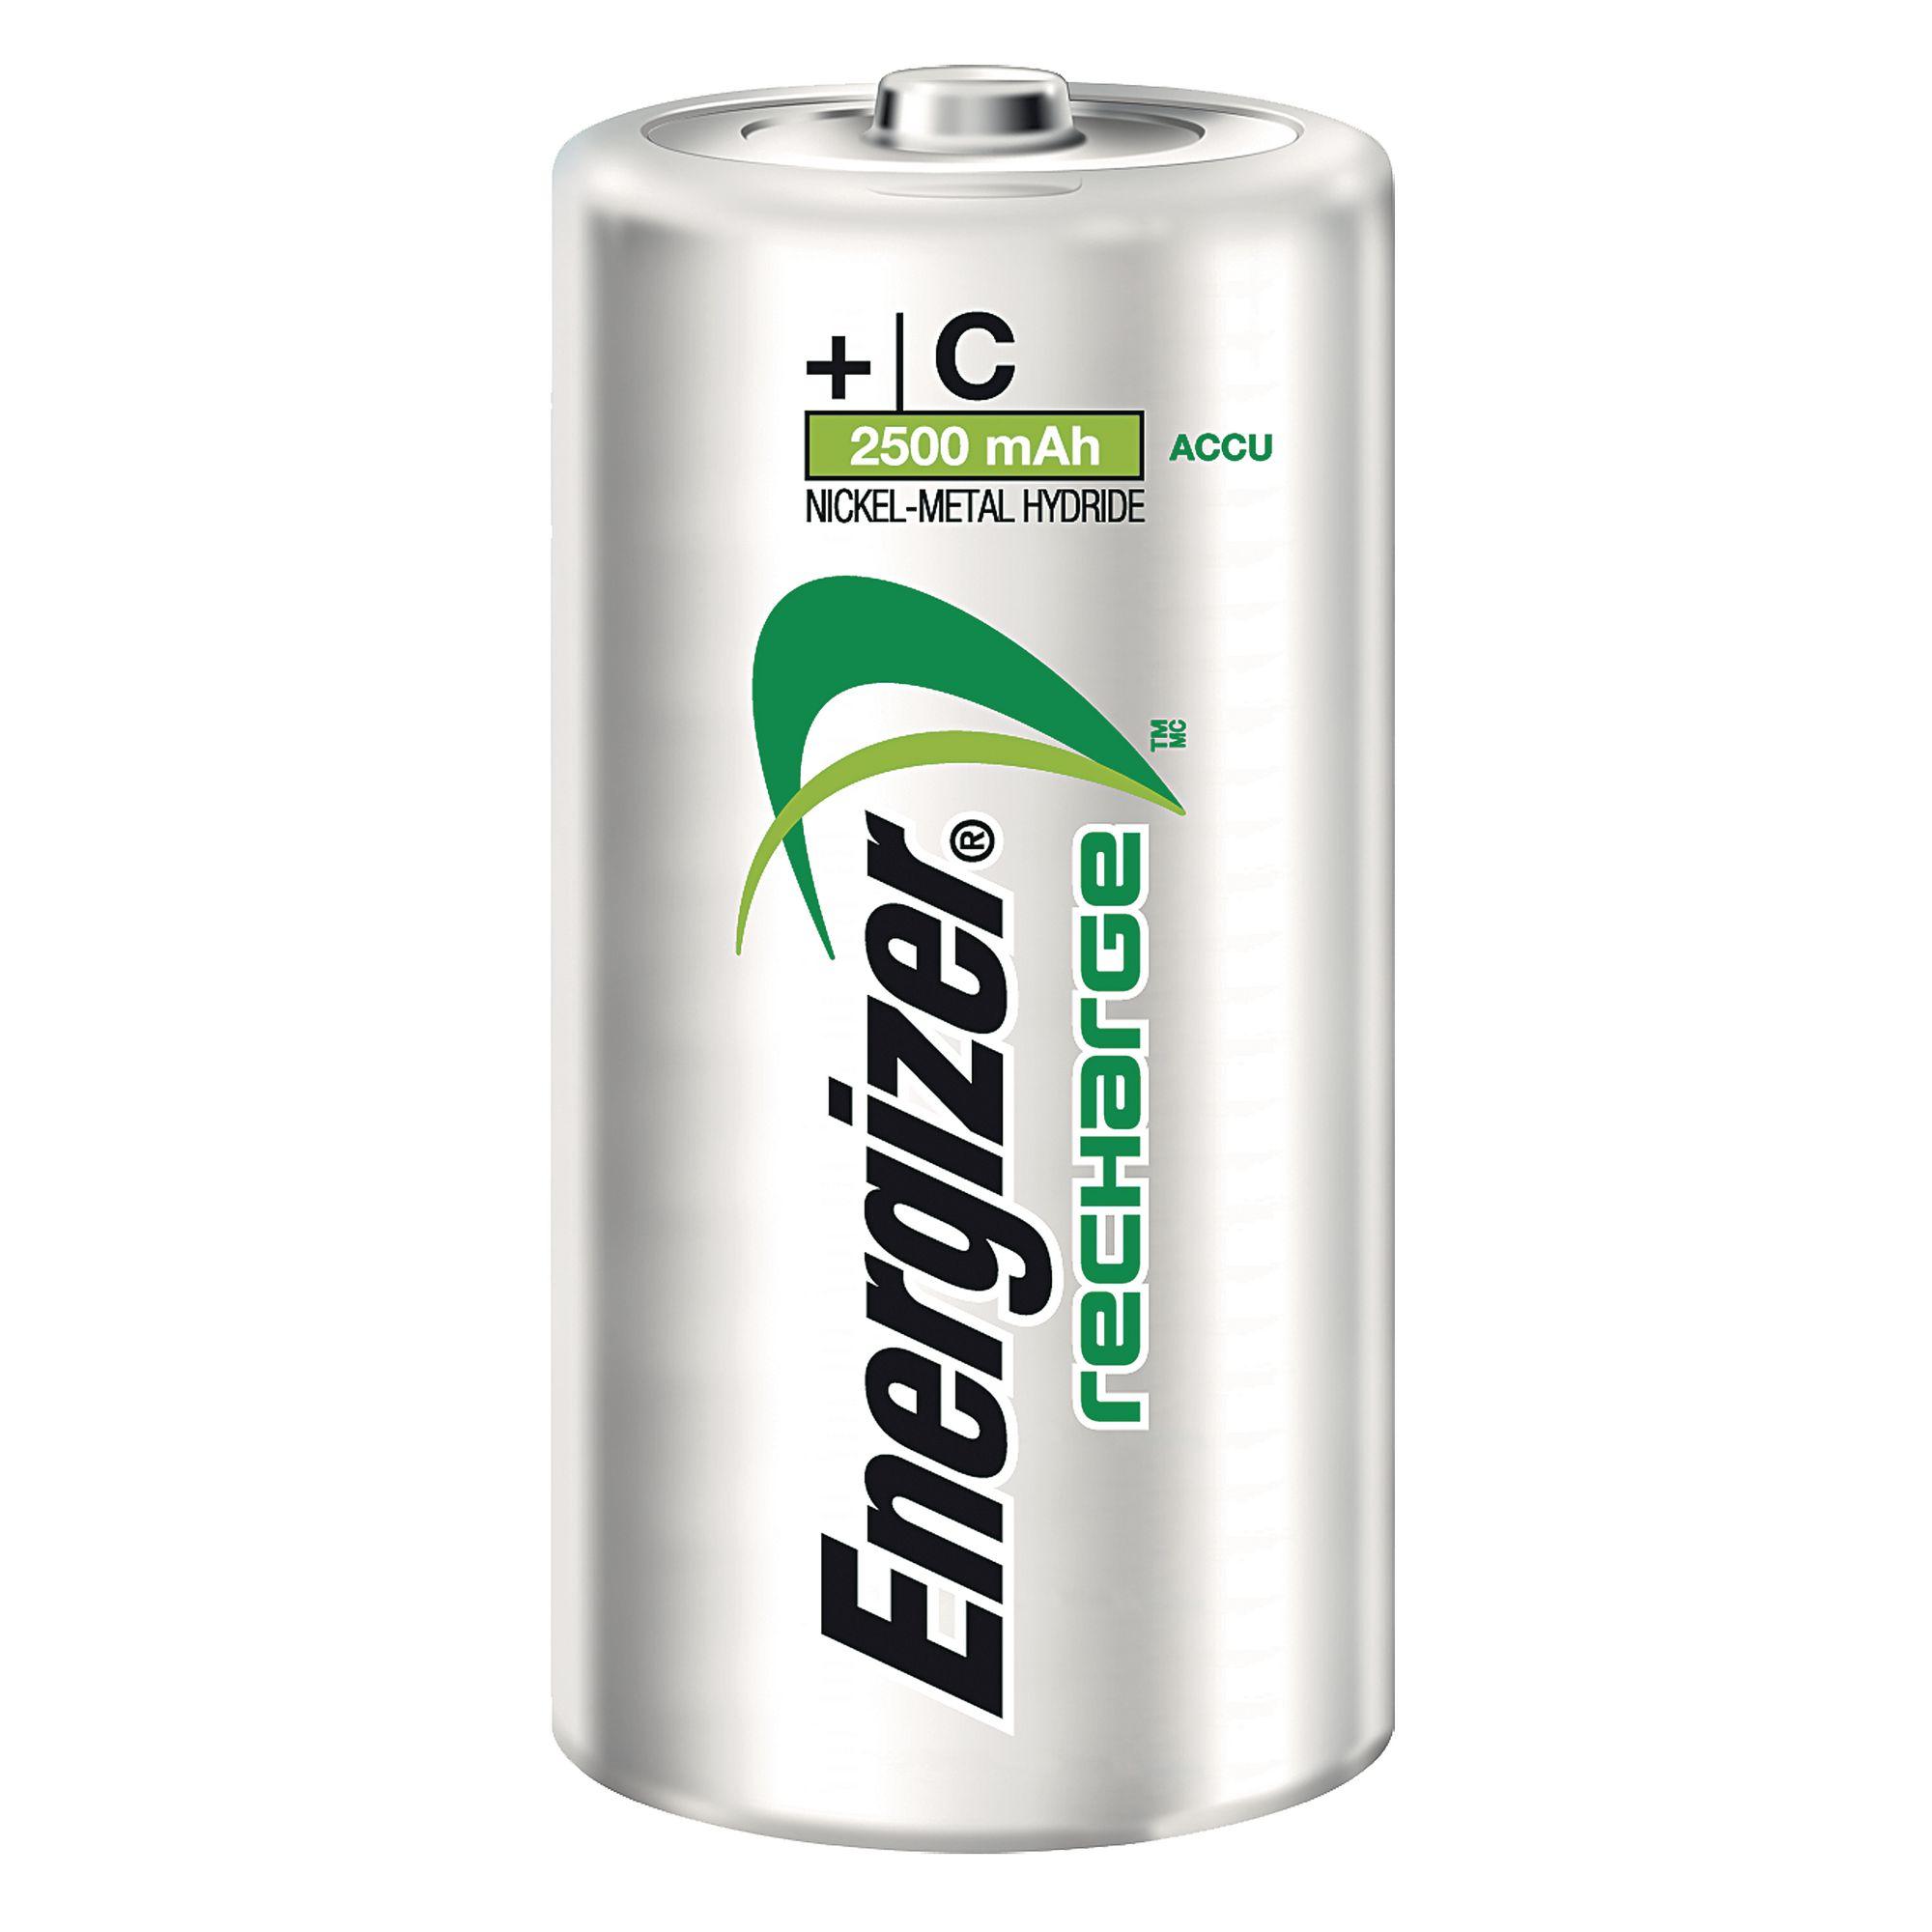 Nickel Metal Hydride Battery >> Rechargeable Nickel Metal Hydride Battery C Hr14